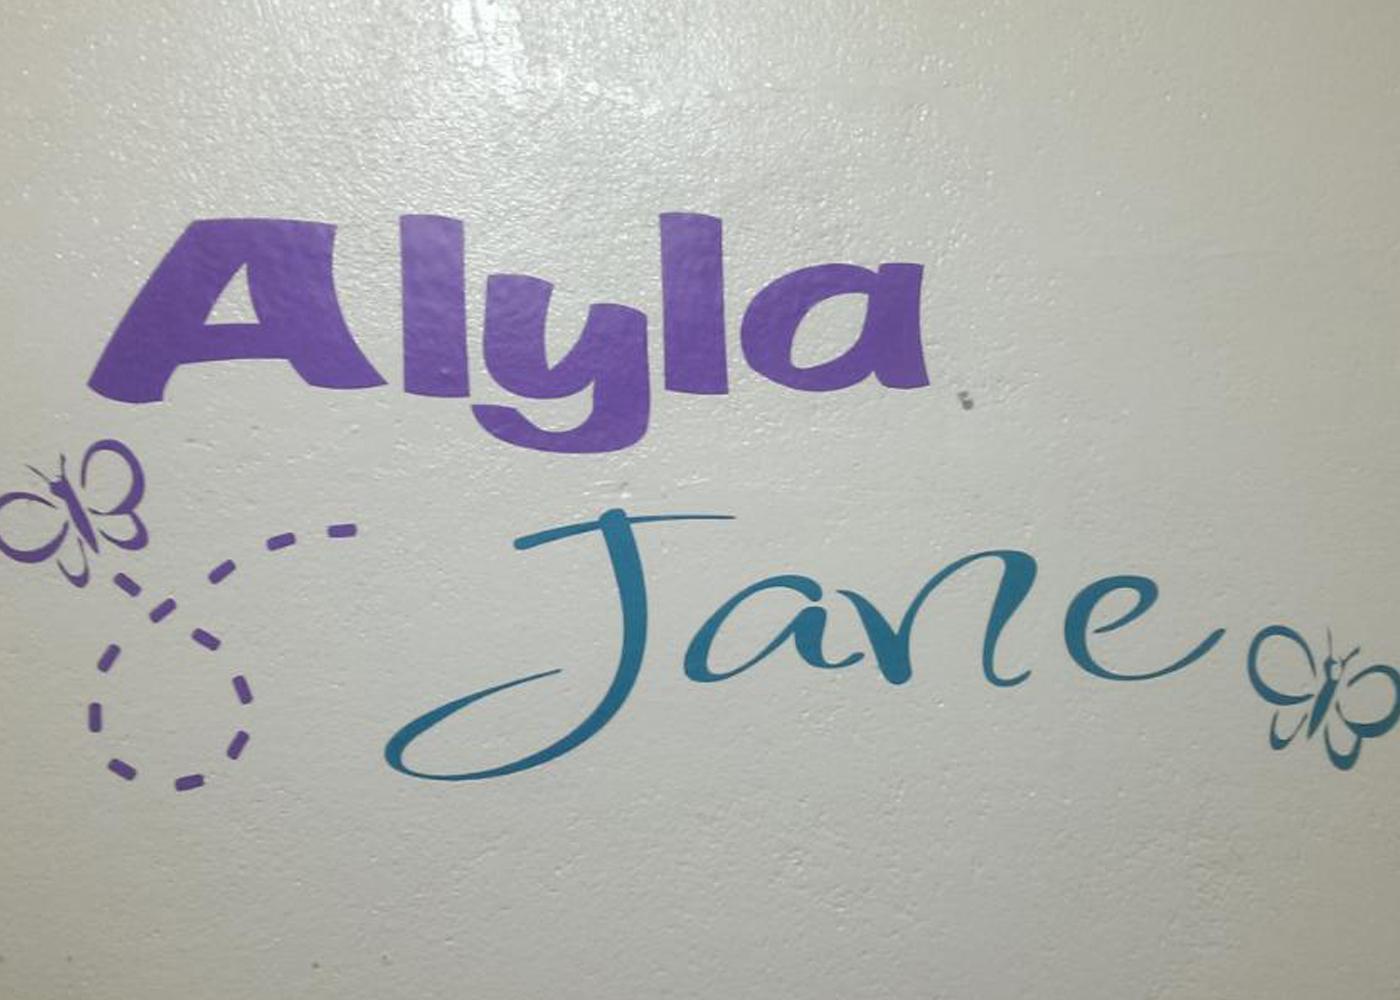 wall-name-vinyl-sticker-2-color-12x36.jpg